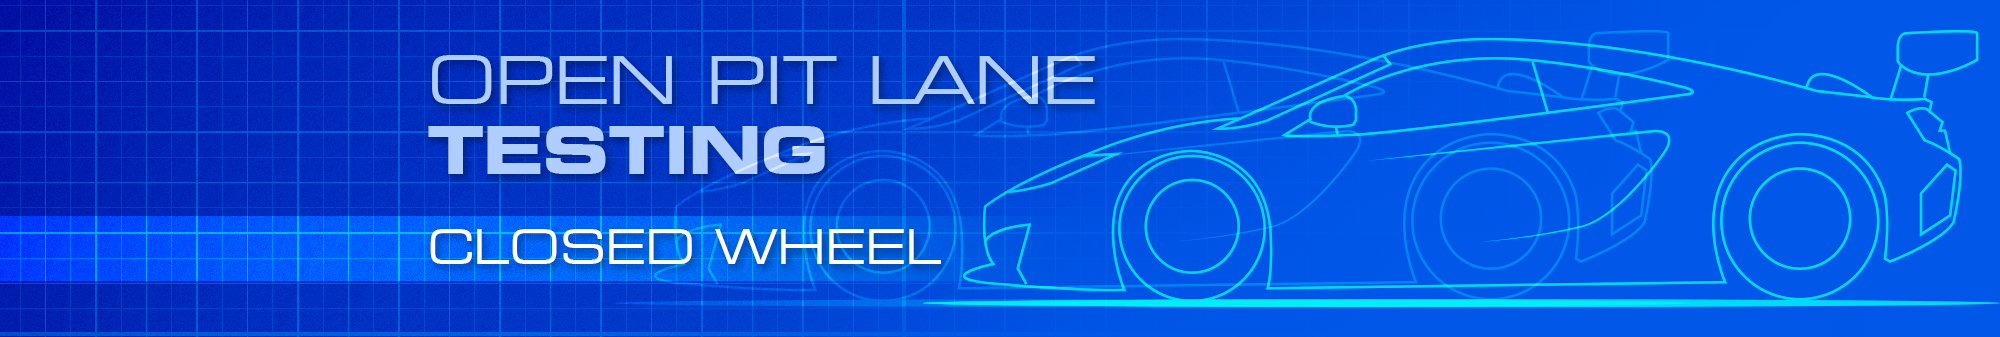 Open Pit Lane Testing  - £255